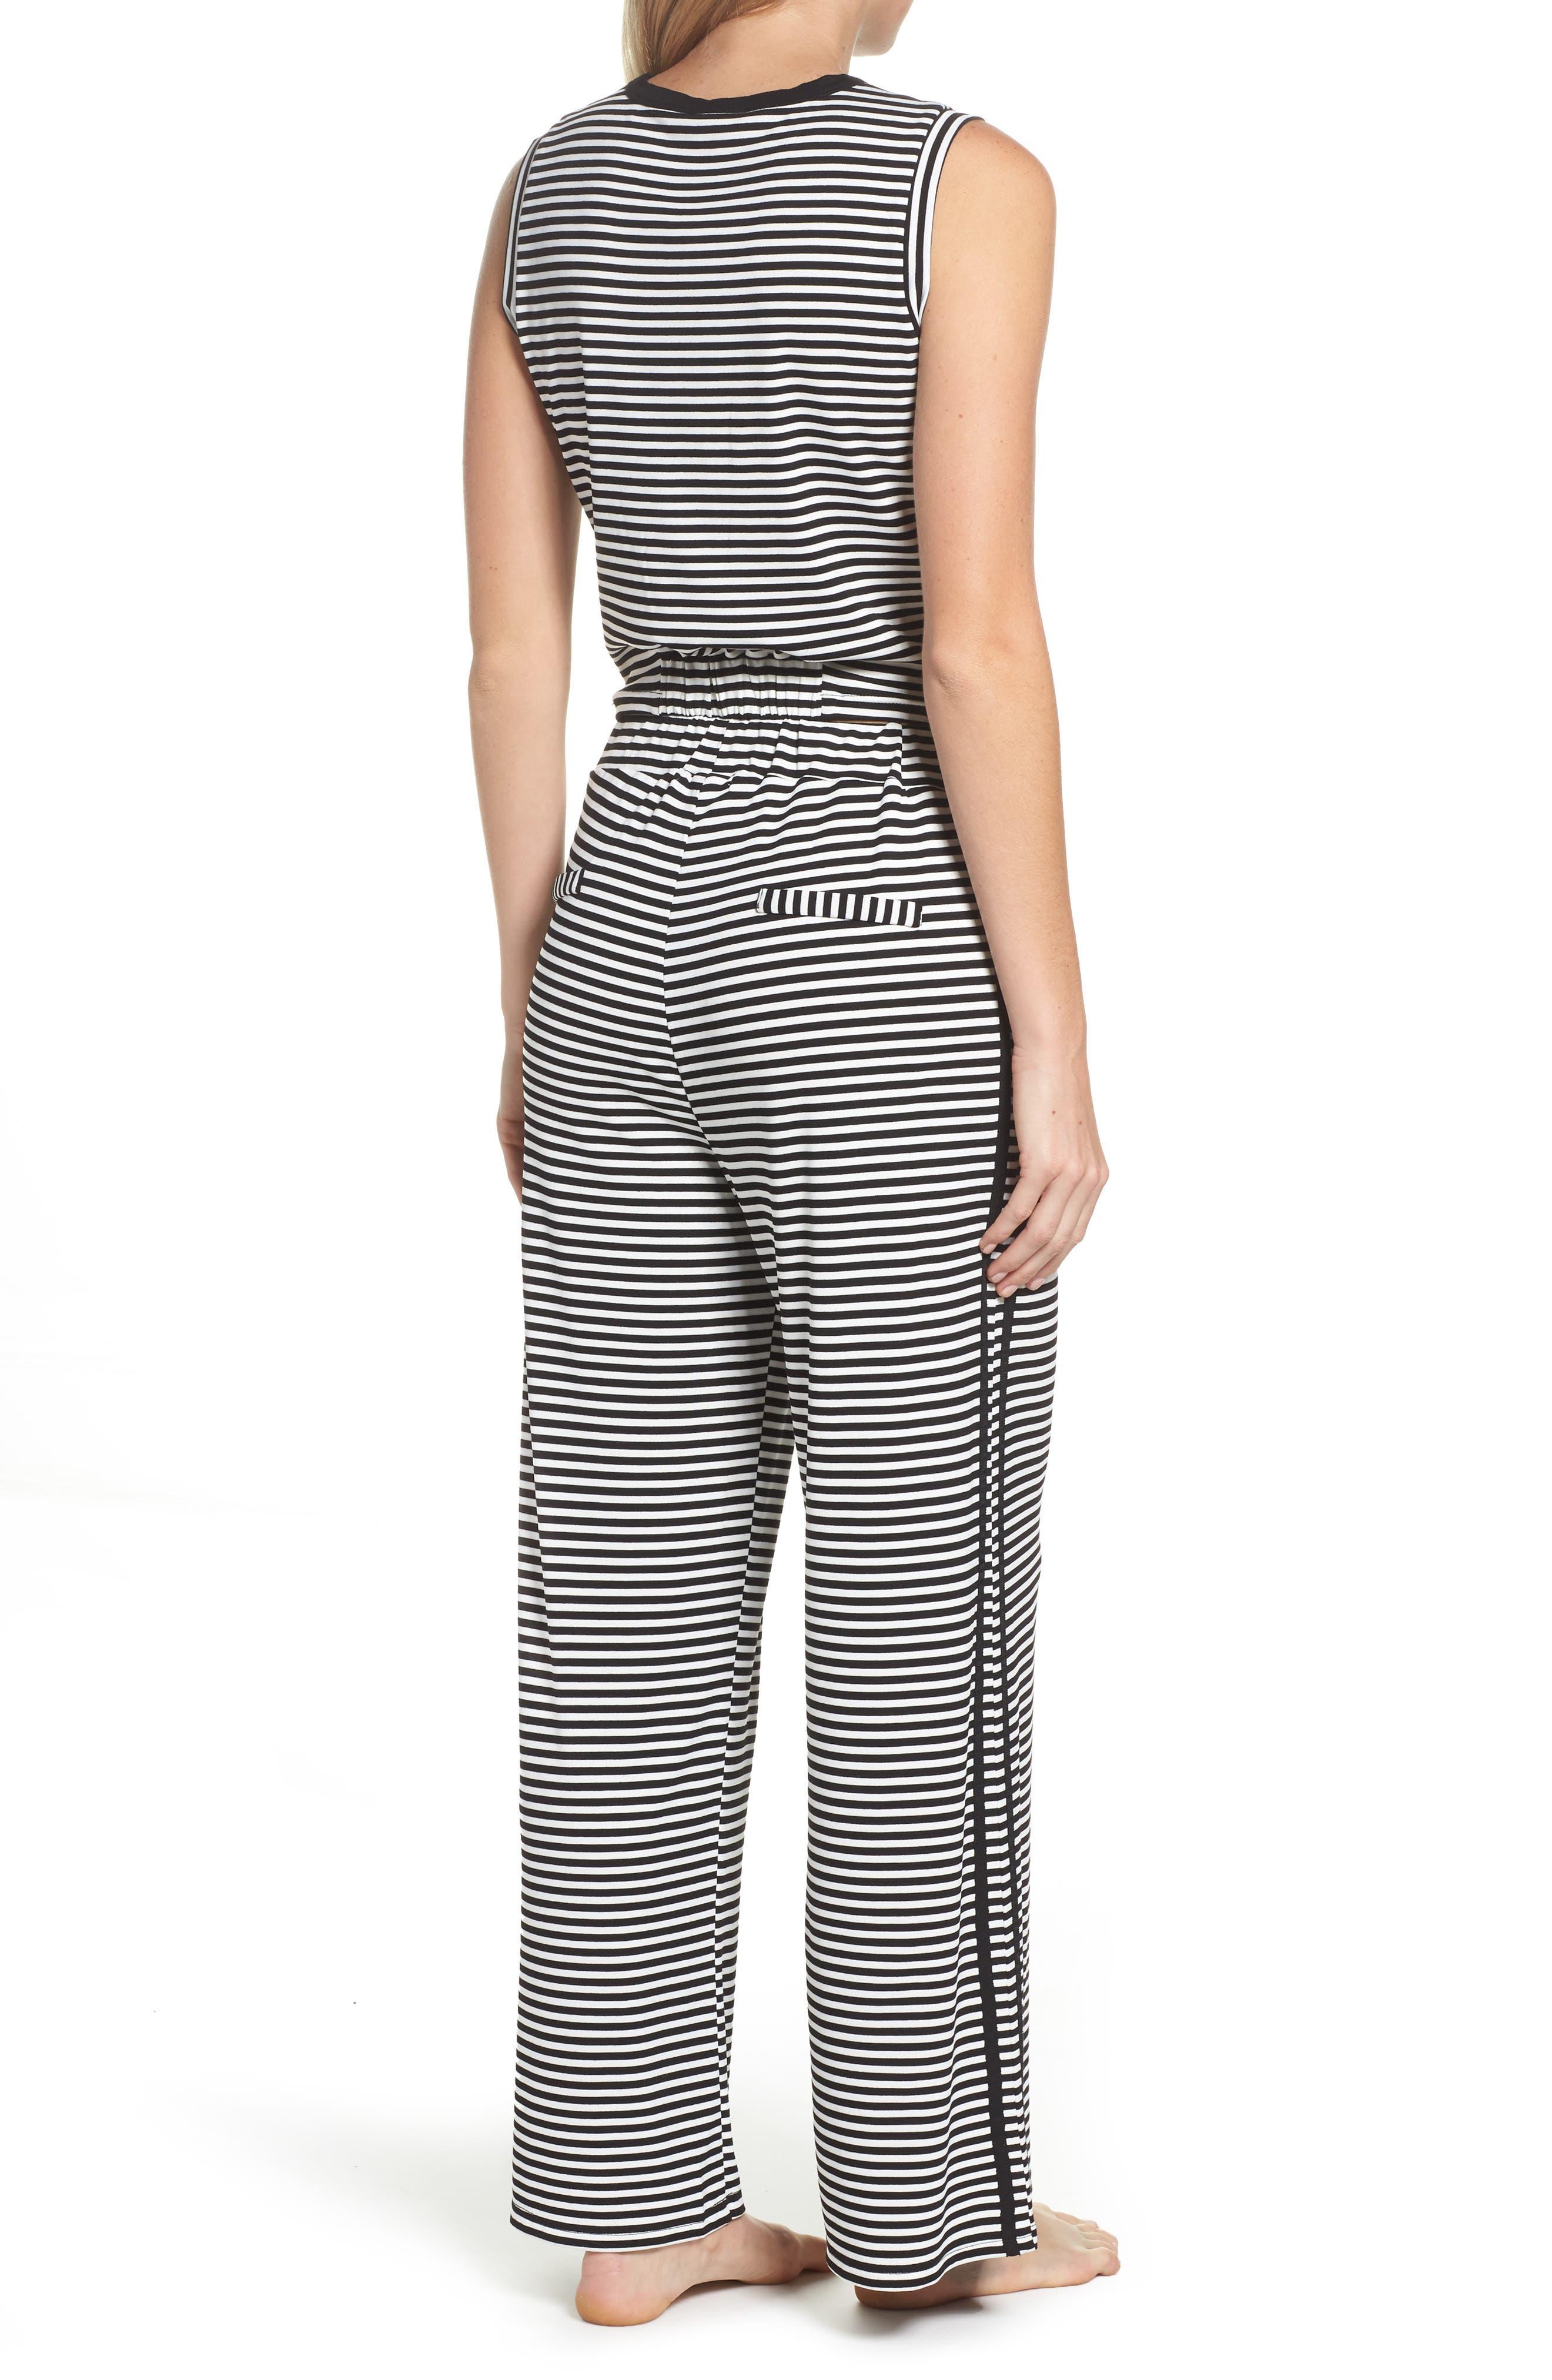 Stripe Pajamas,                             Alternate thumbnail 2, color,                             BLACK/ WHITE